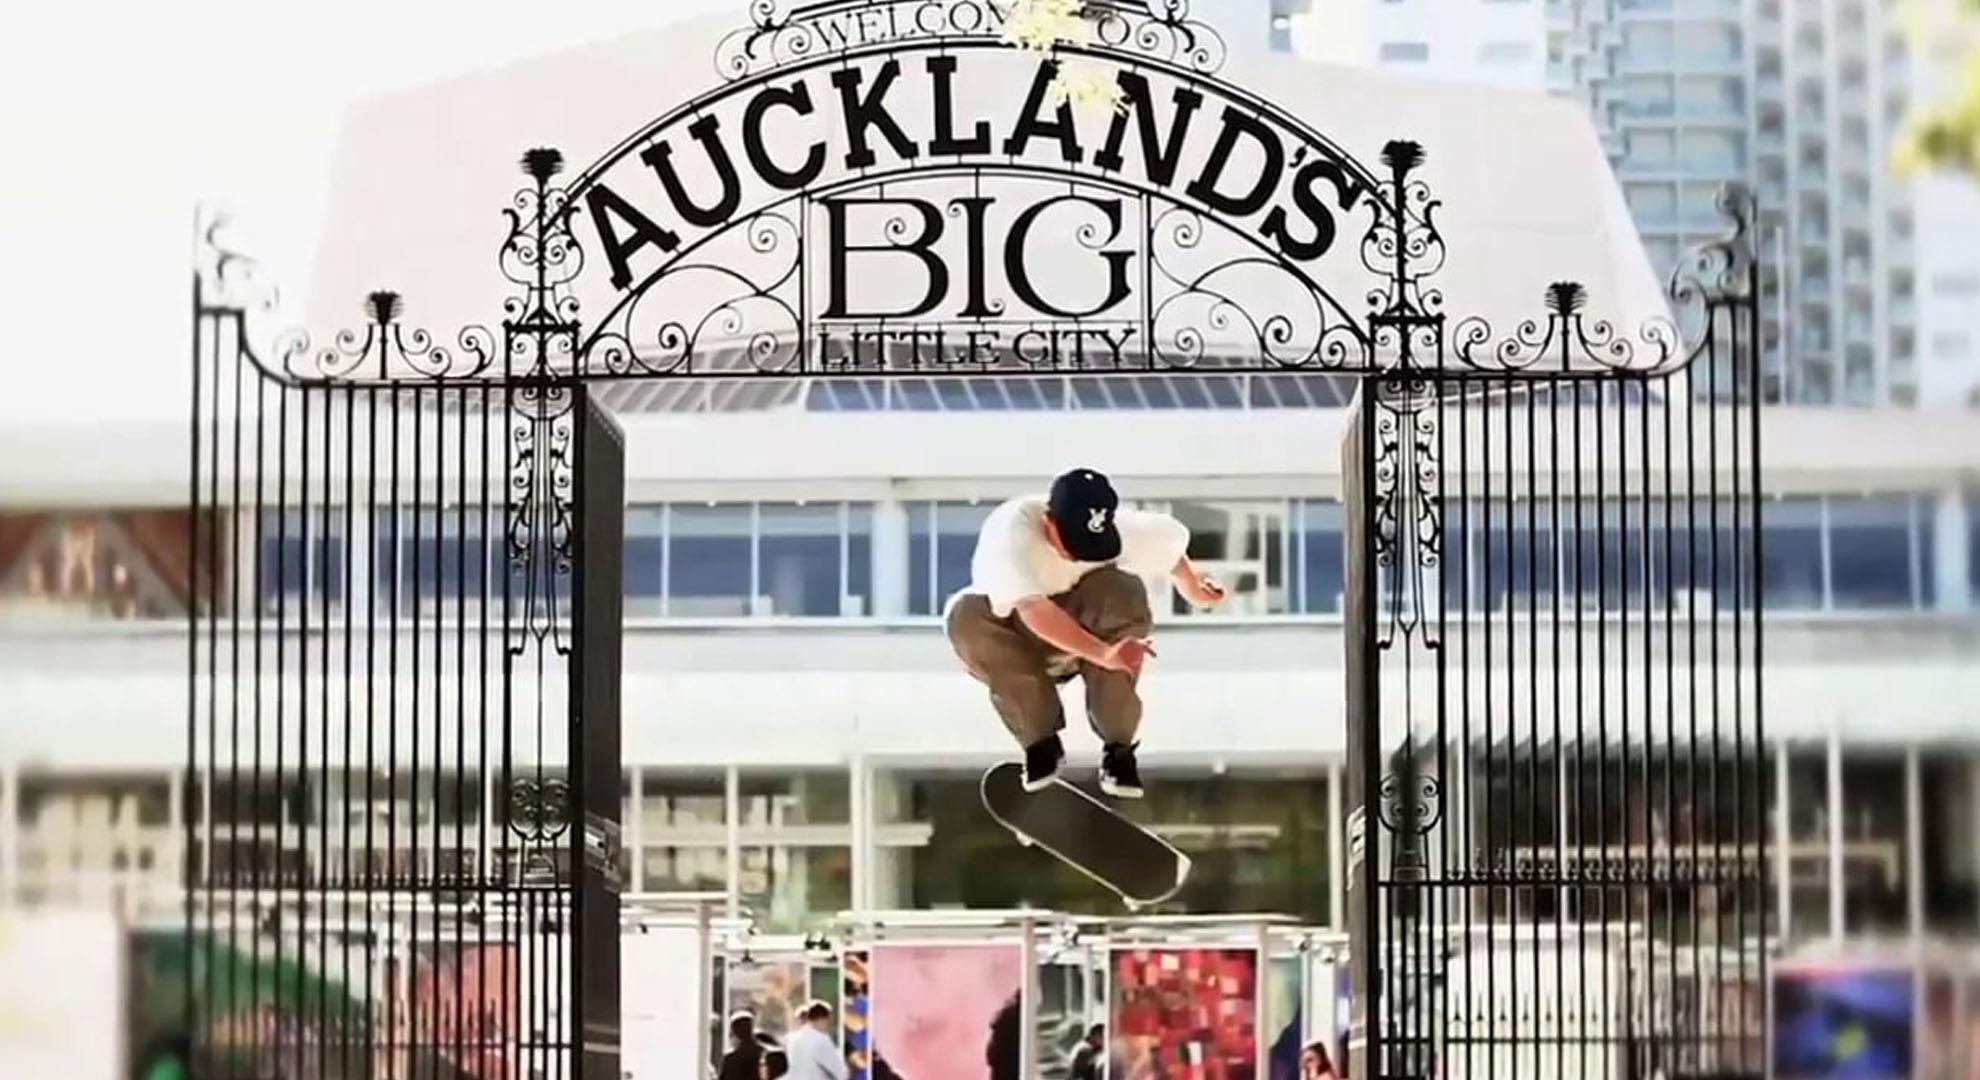 Documentary: Skateboarding VS Architecture